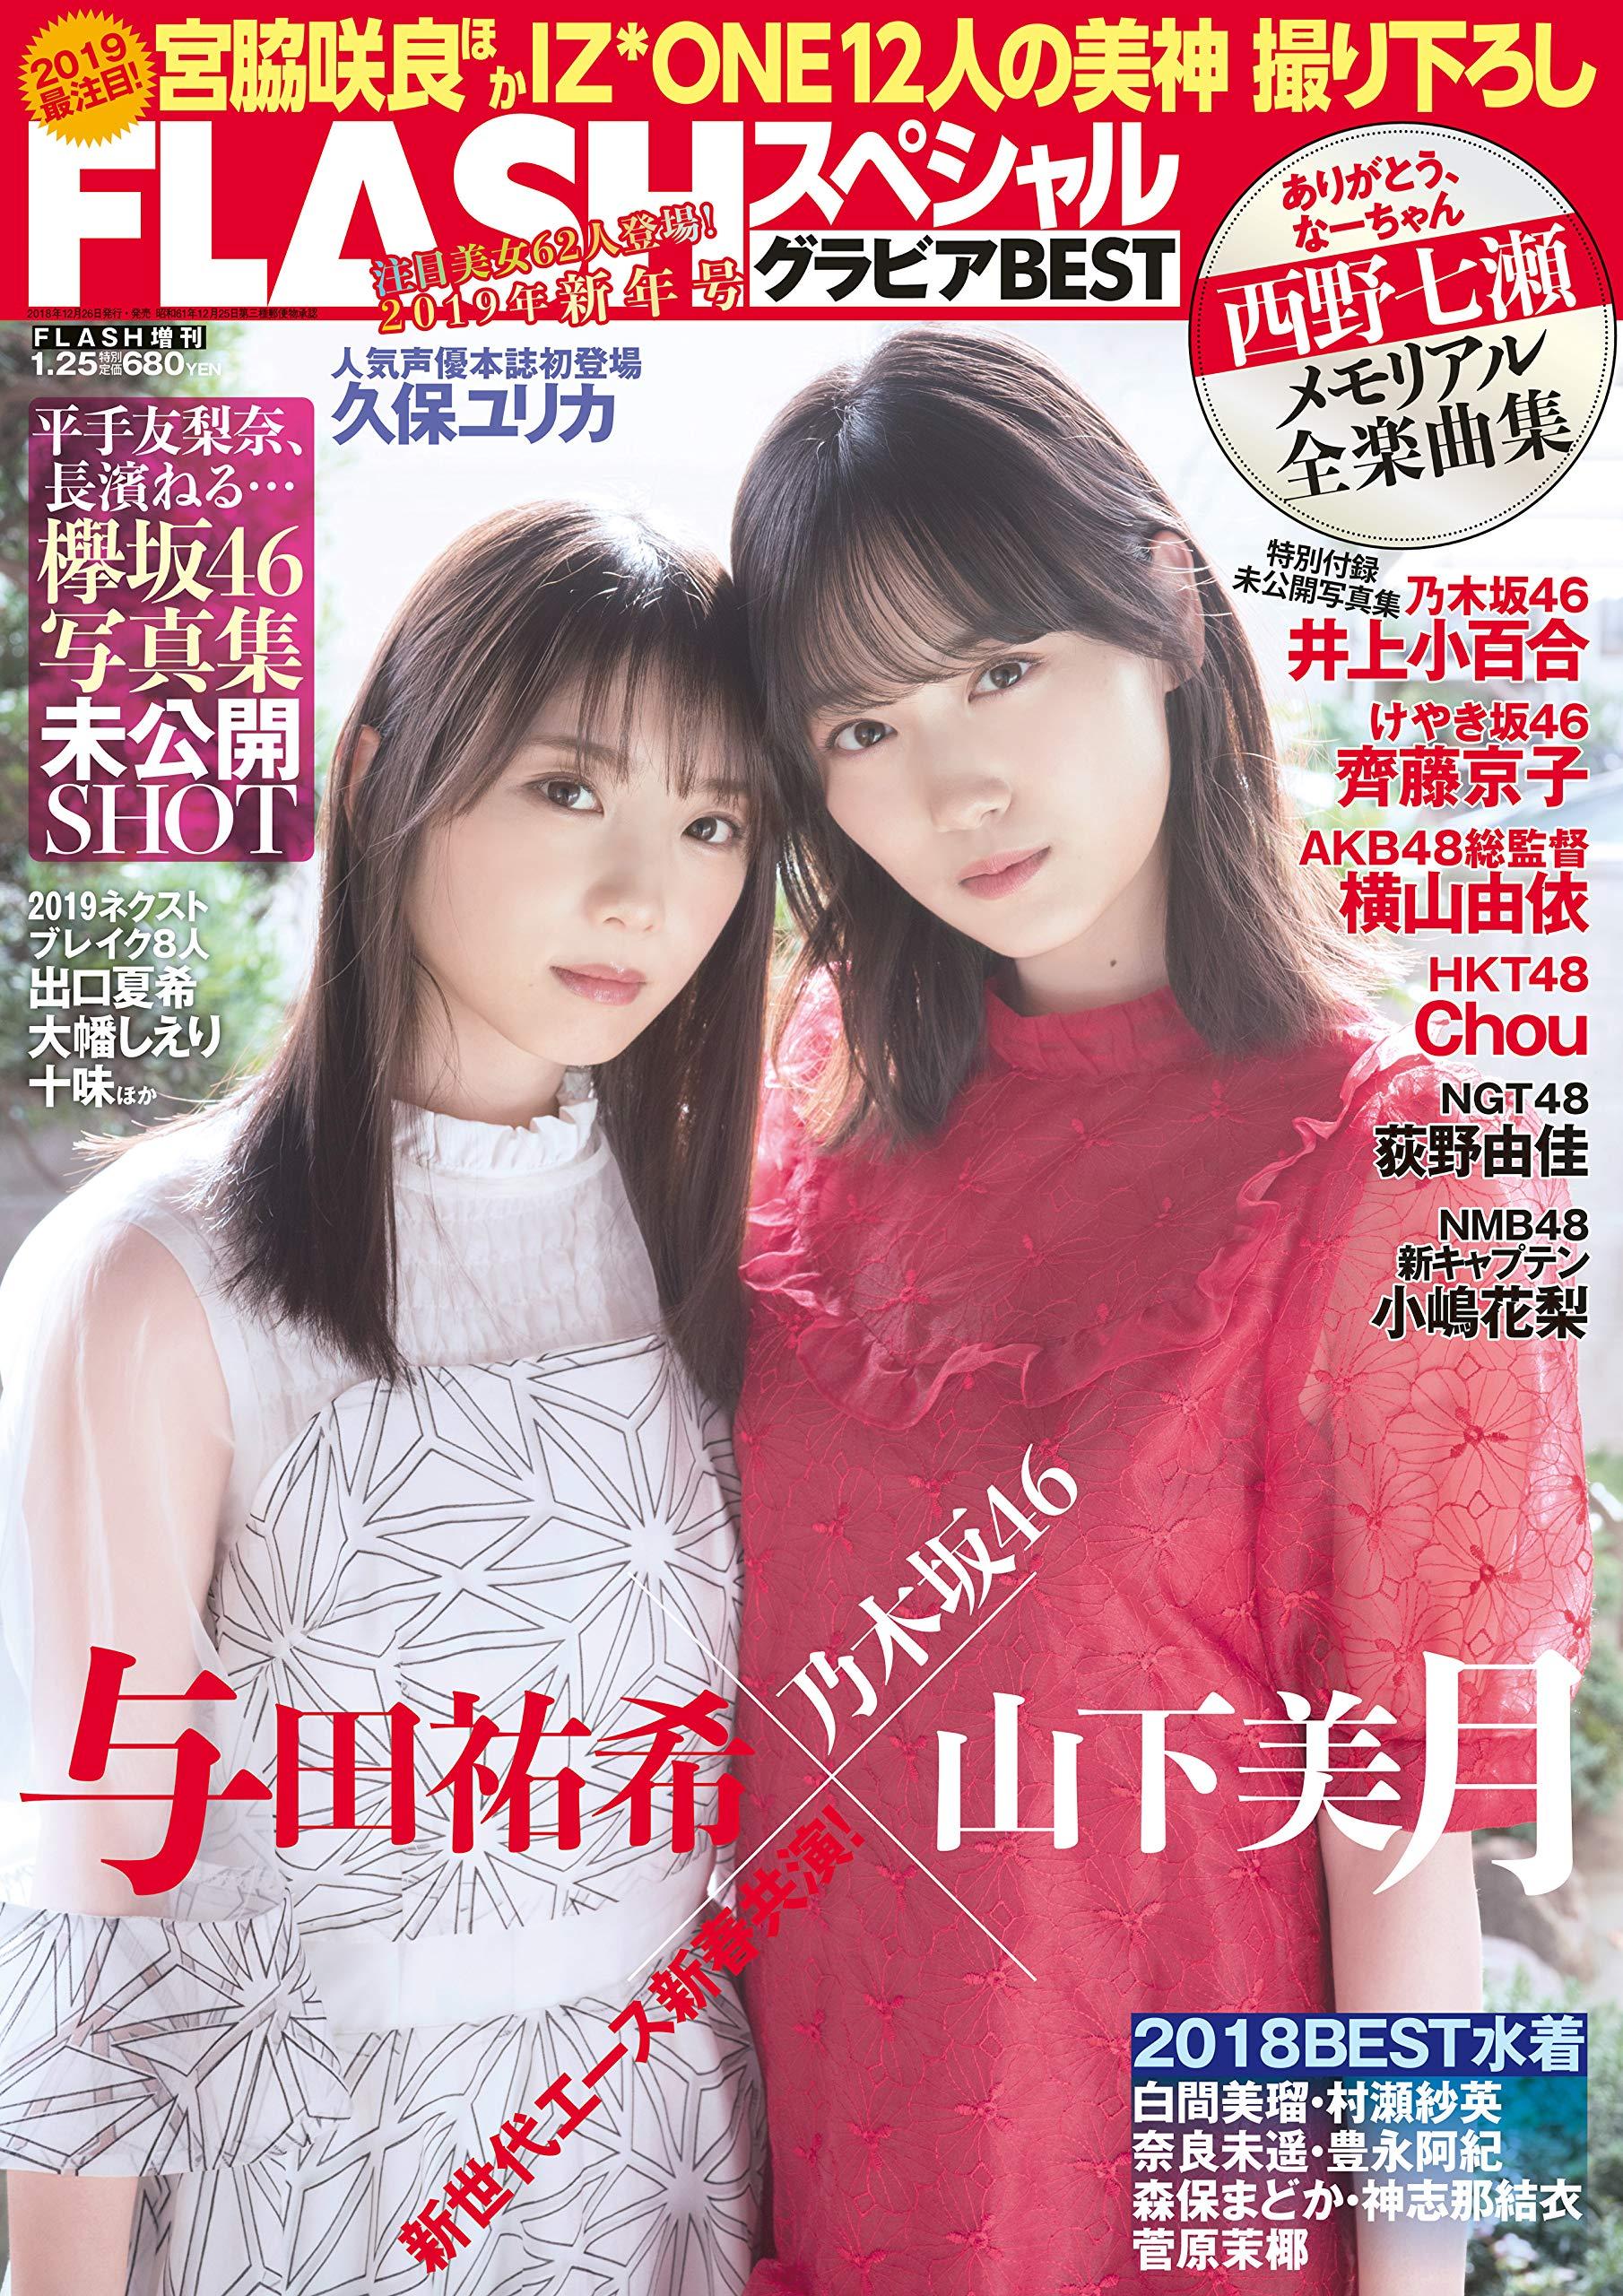 FLASHスペシャルグラビアBEST2019新年号のNGT48荻野由佳グラビアが正直気持ち悪かった